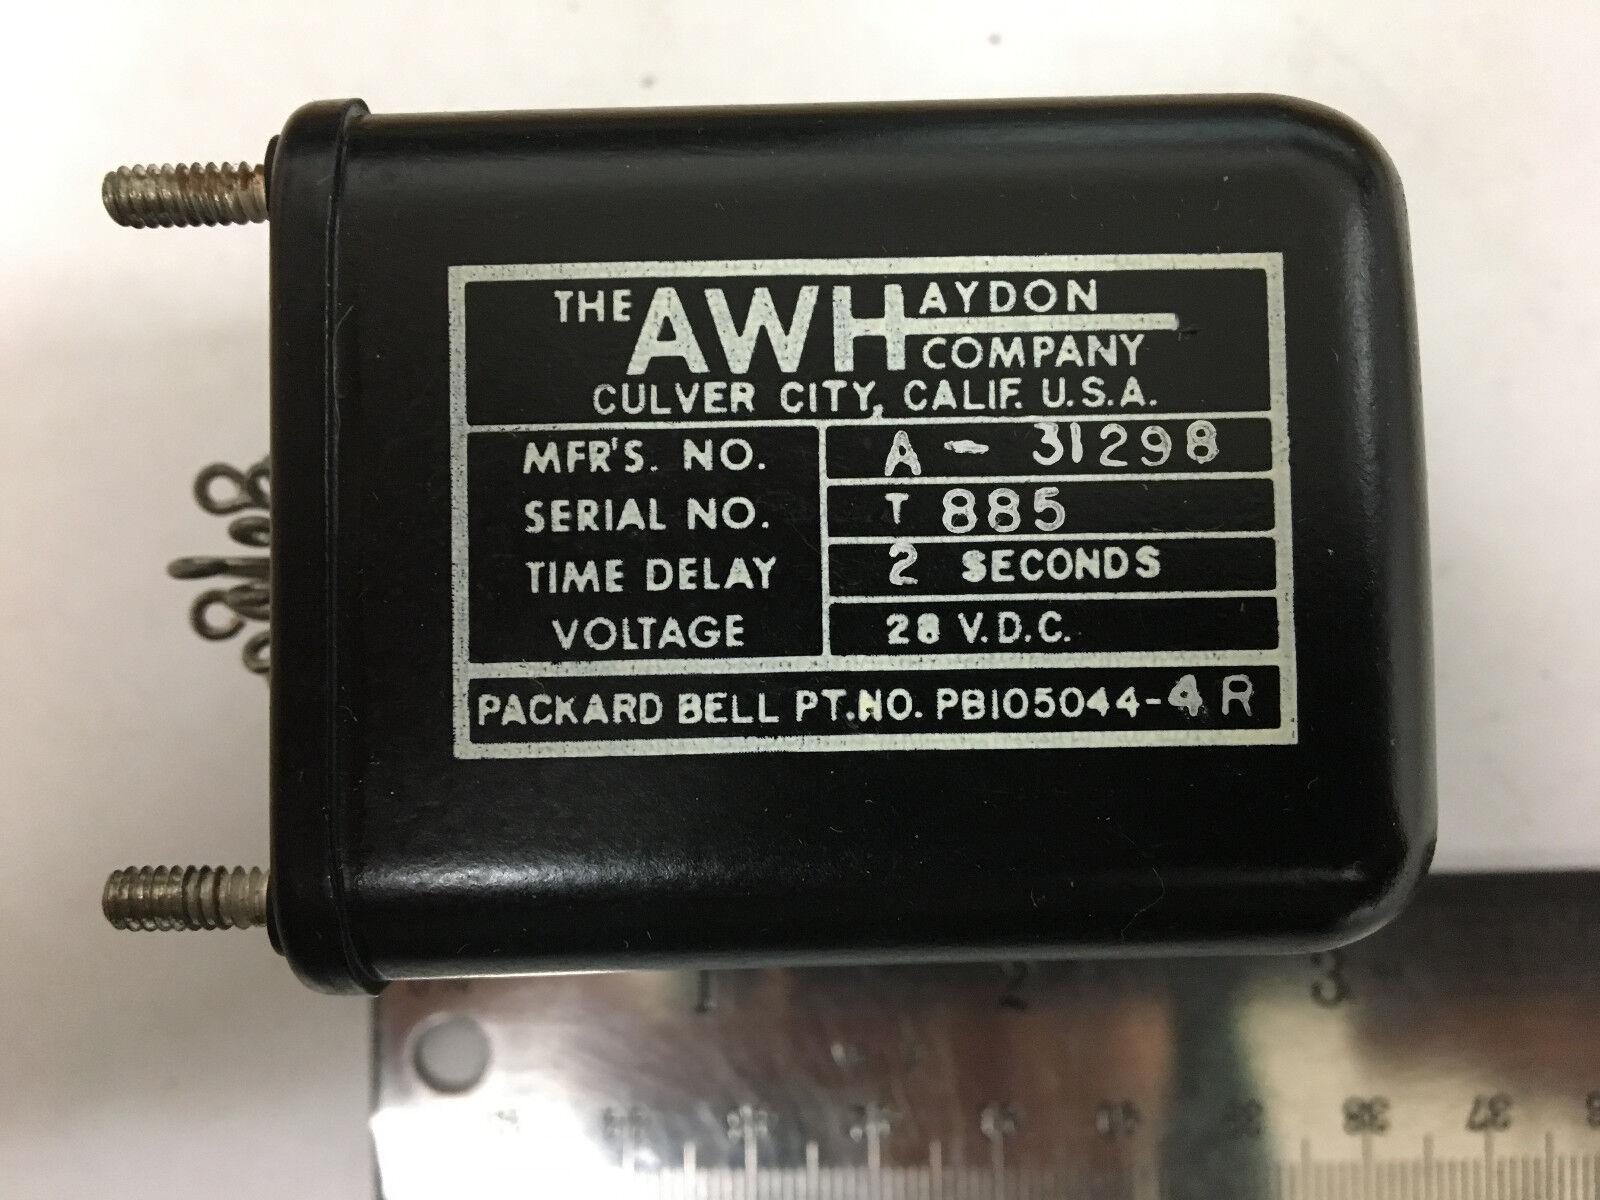 La empresa Vcc awhaydon PB105044-4R A-31298 28 Vcc empresa 2 segundos 282f43